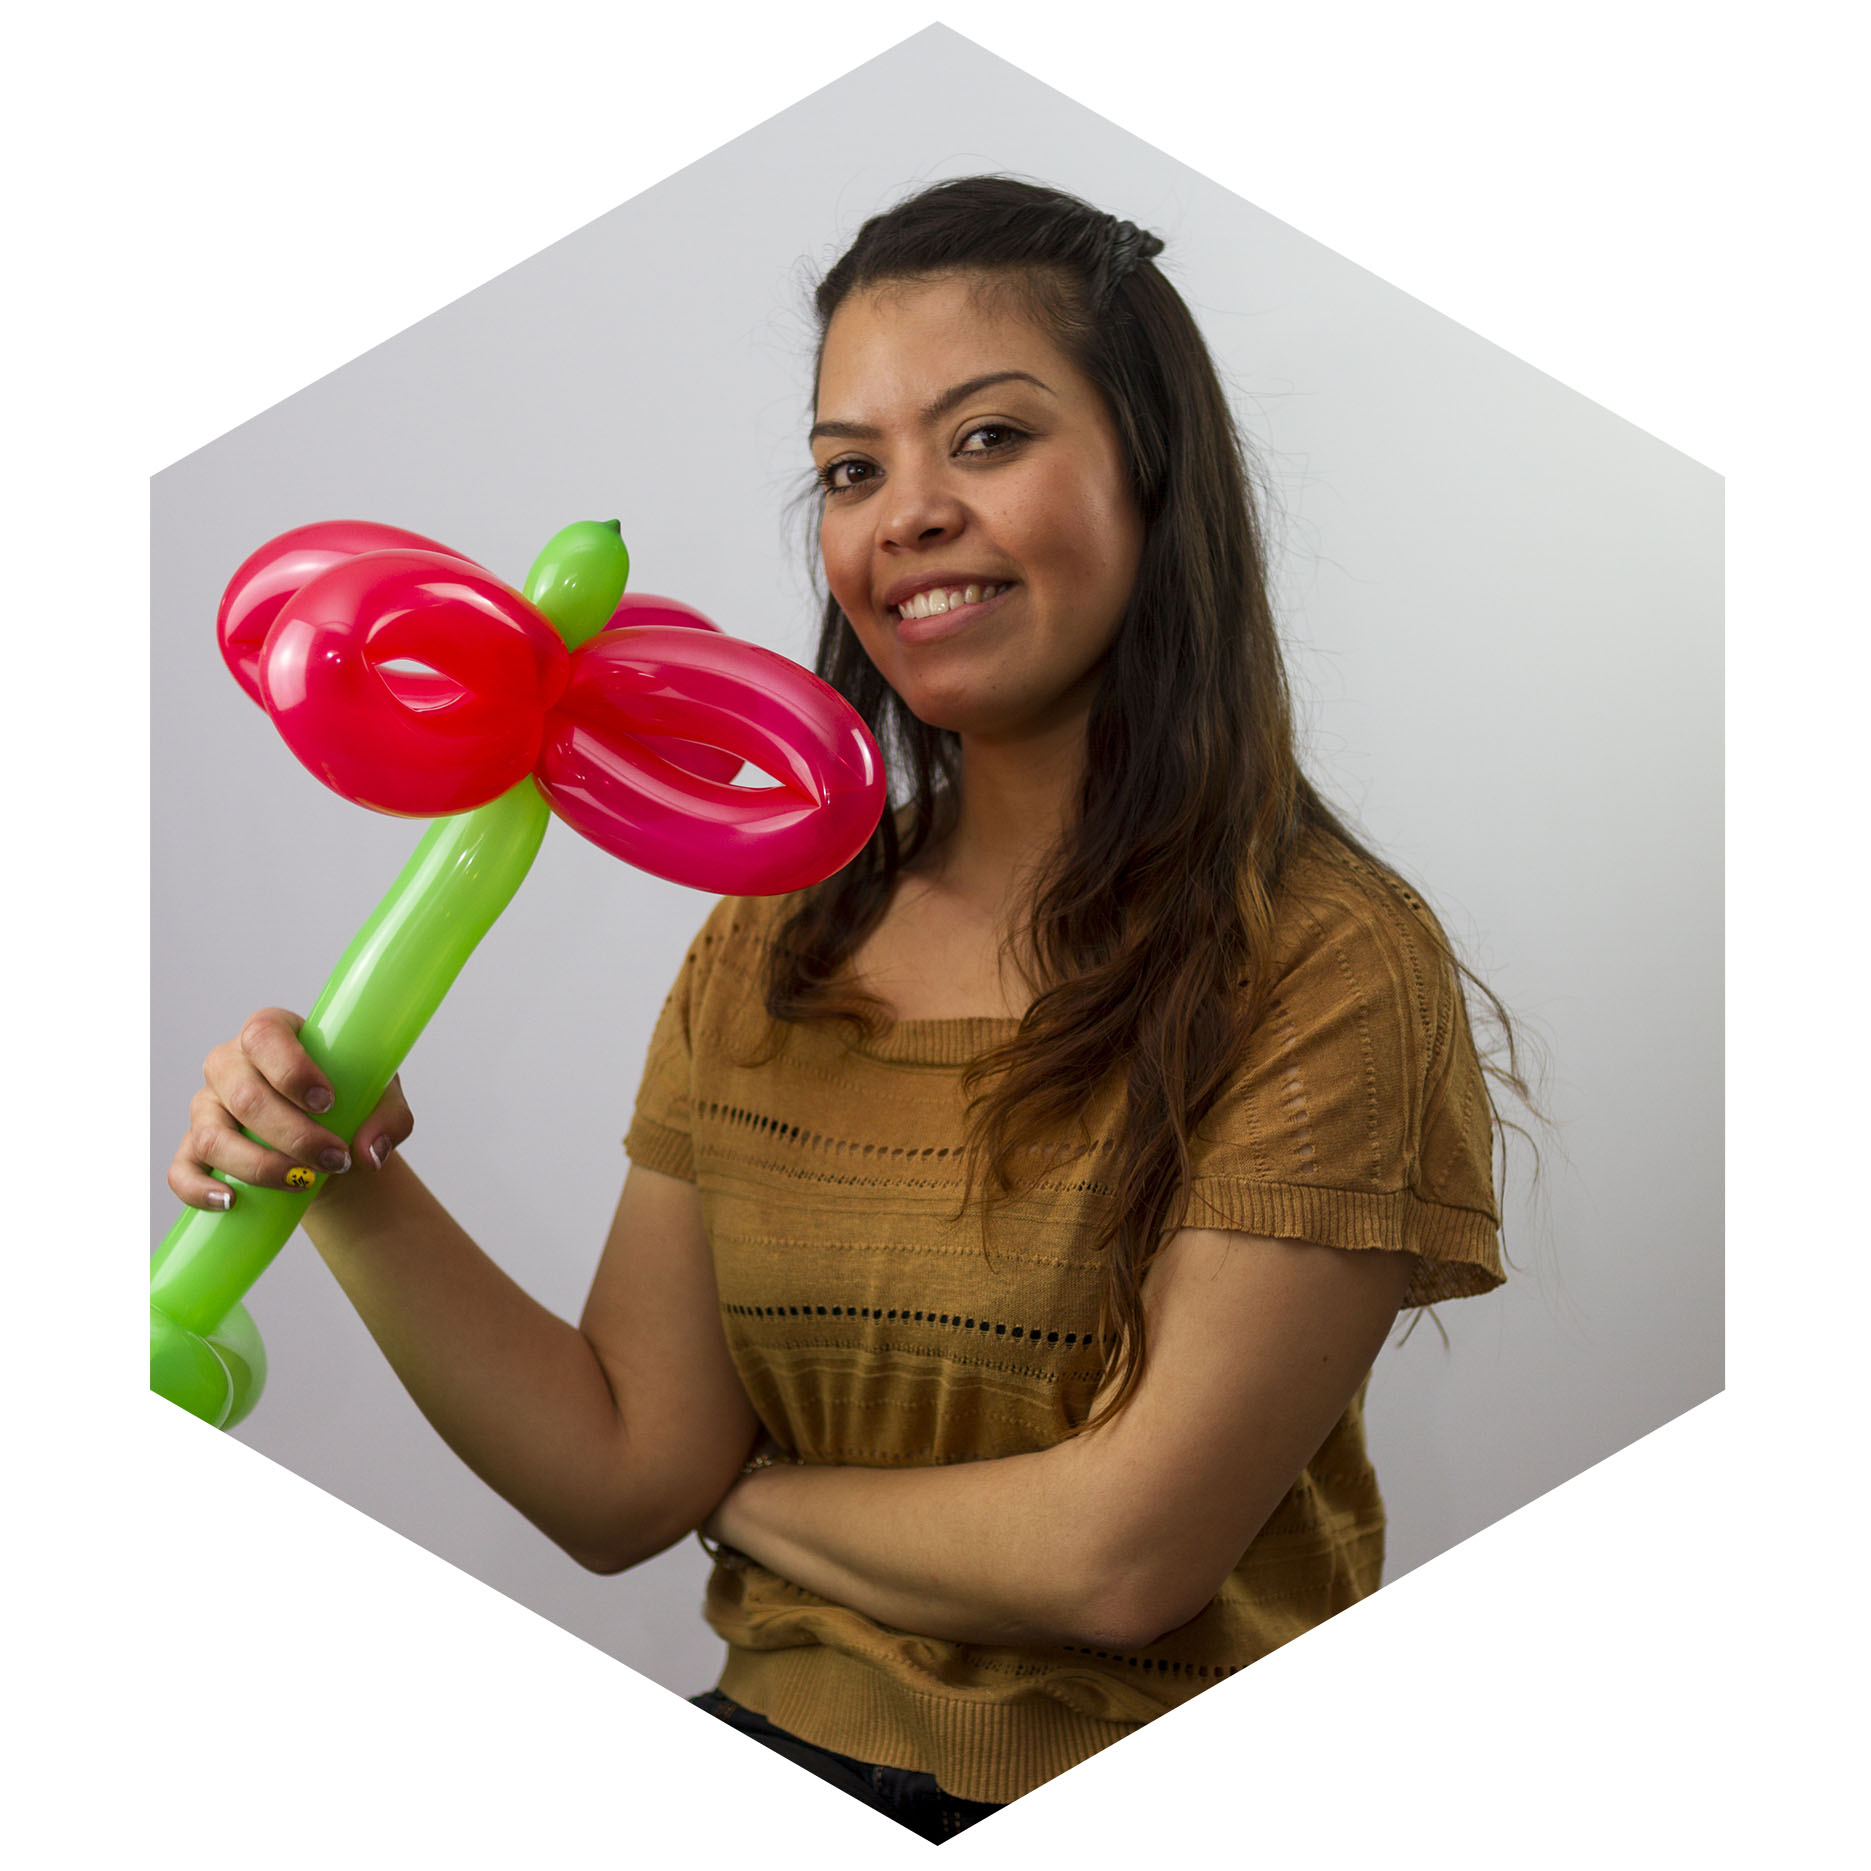 Paula Andrea Díaz